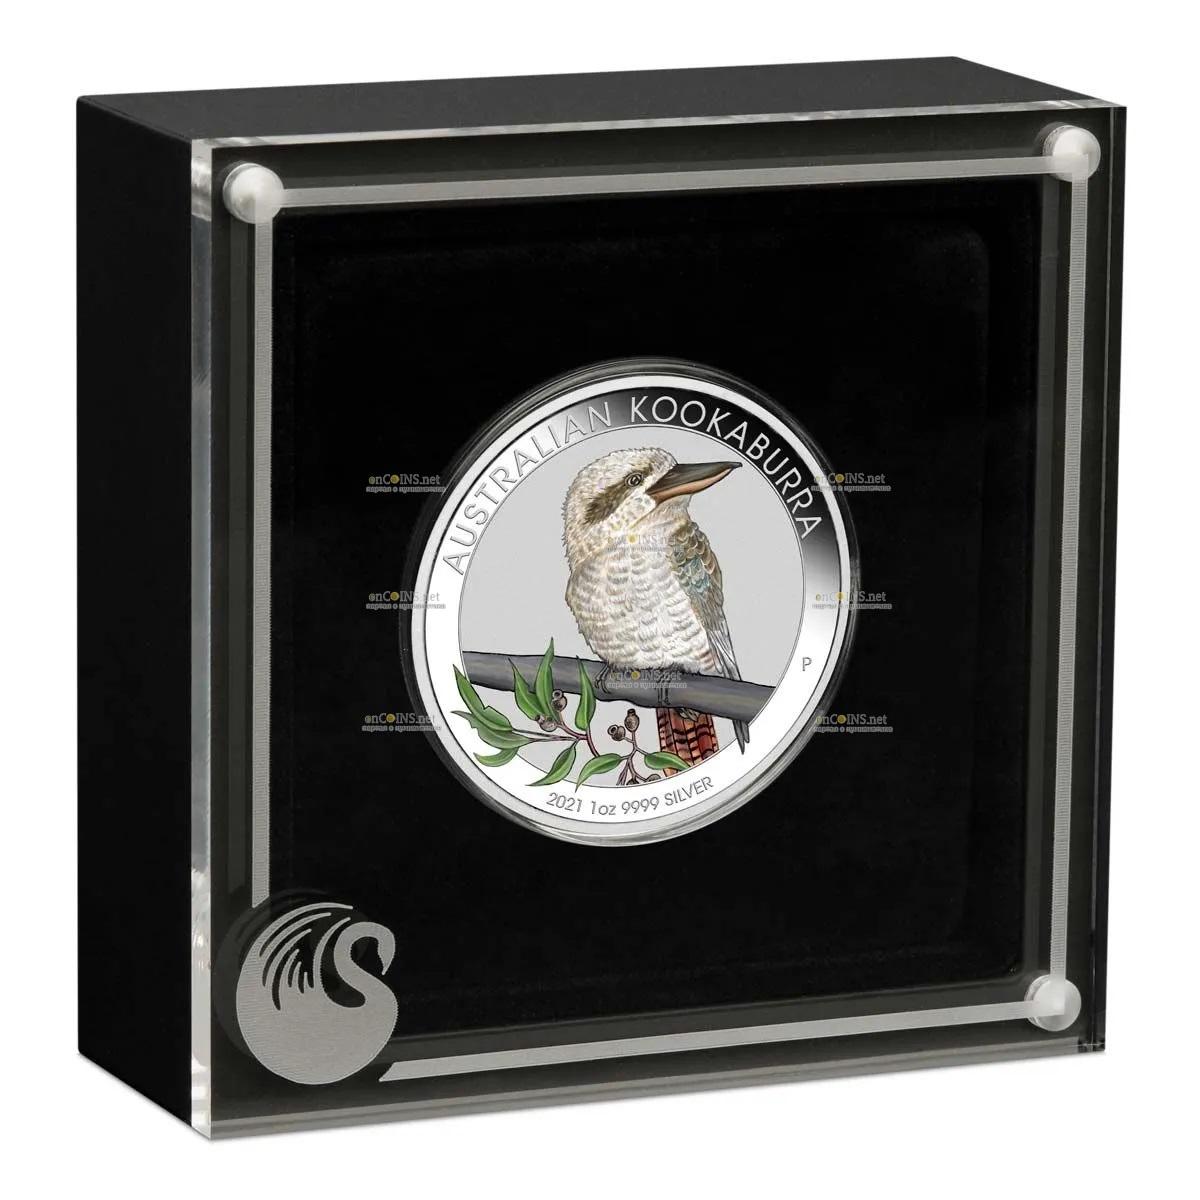 Австралия монета 1 доллар кукабара, подарочная упаковка